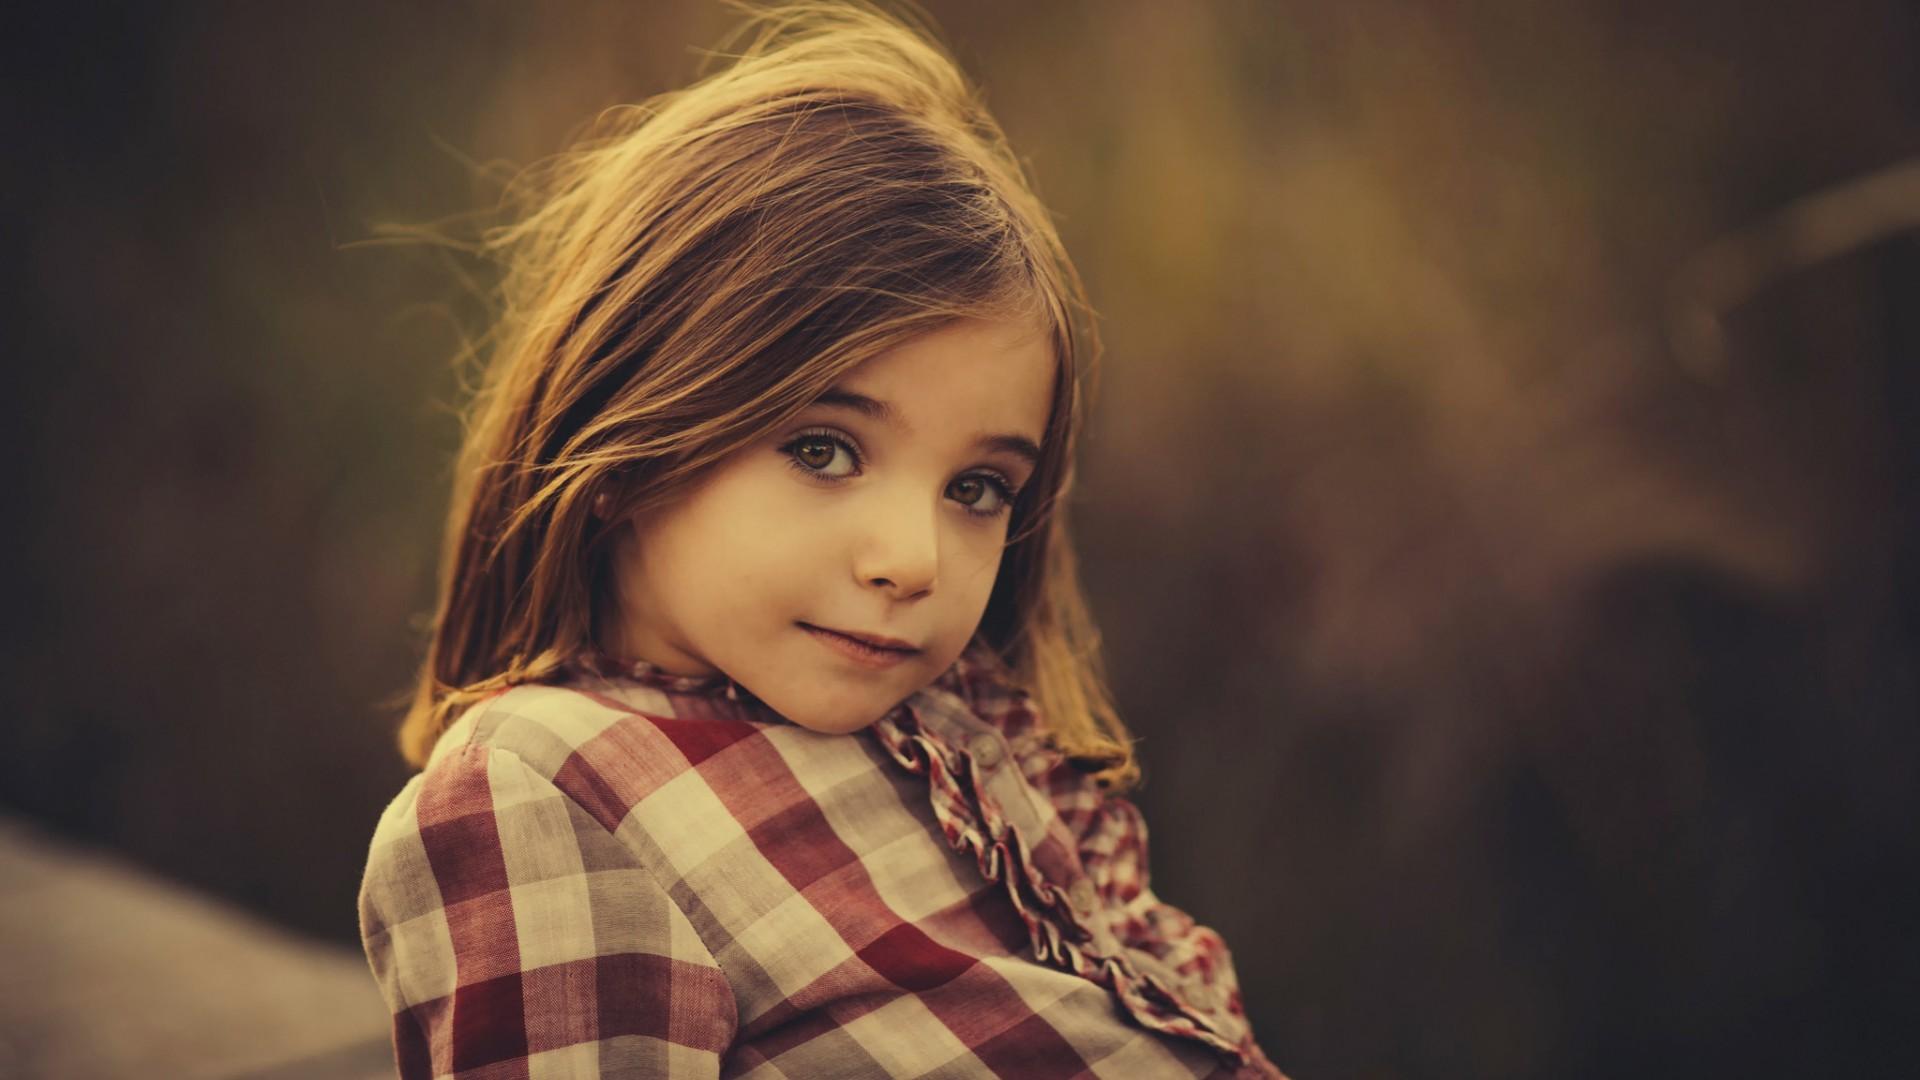 Hintergrundbilder Modell Portrat Lange Haare Kinder